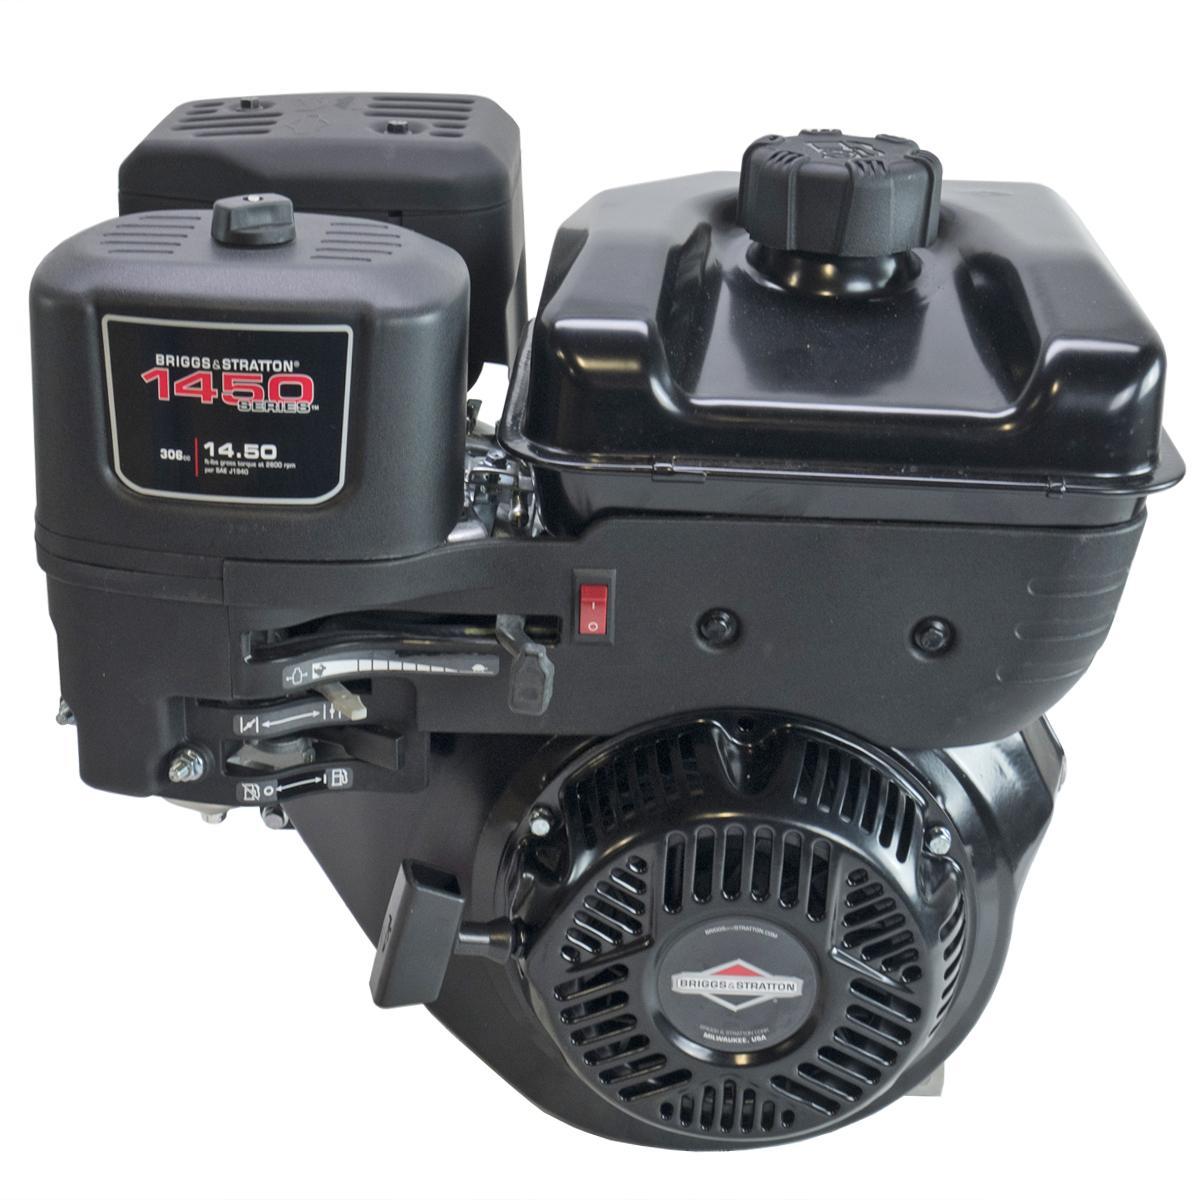 "1450 XR Professional Series Horizontal 1""x 3-31/64"" Keyed Shaft, Recoil Start, Dual Ball Bearings, Briggs & Stratton Engine"